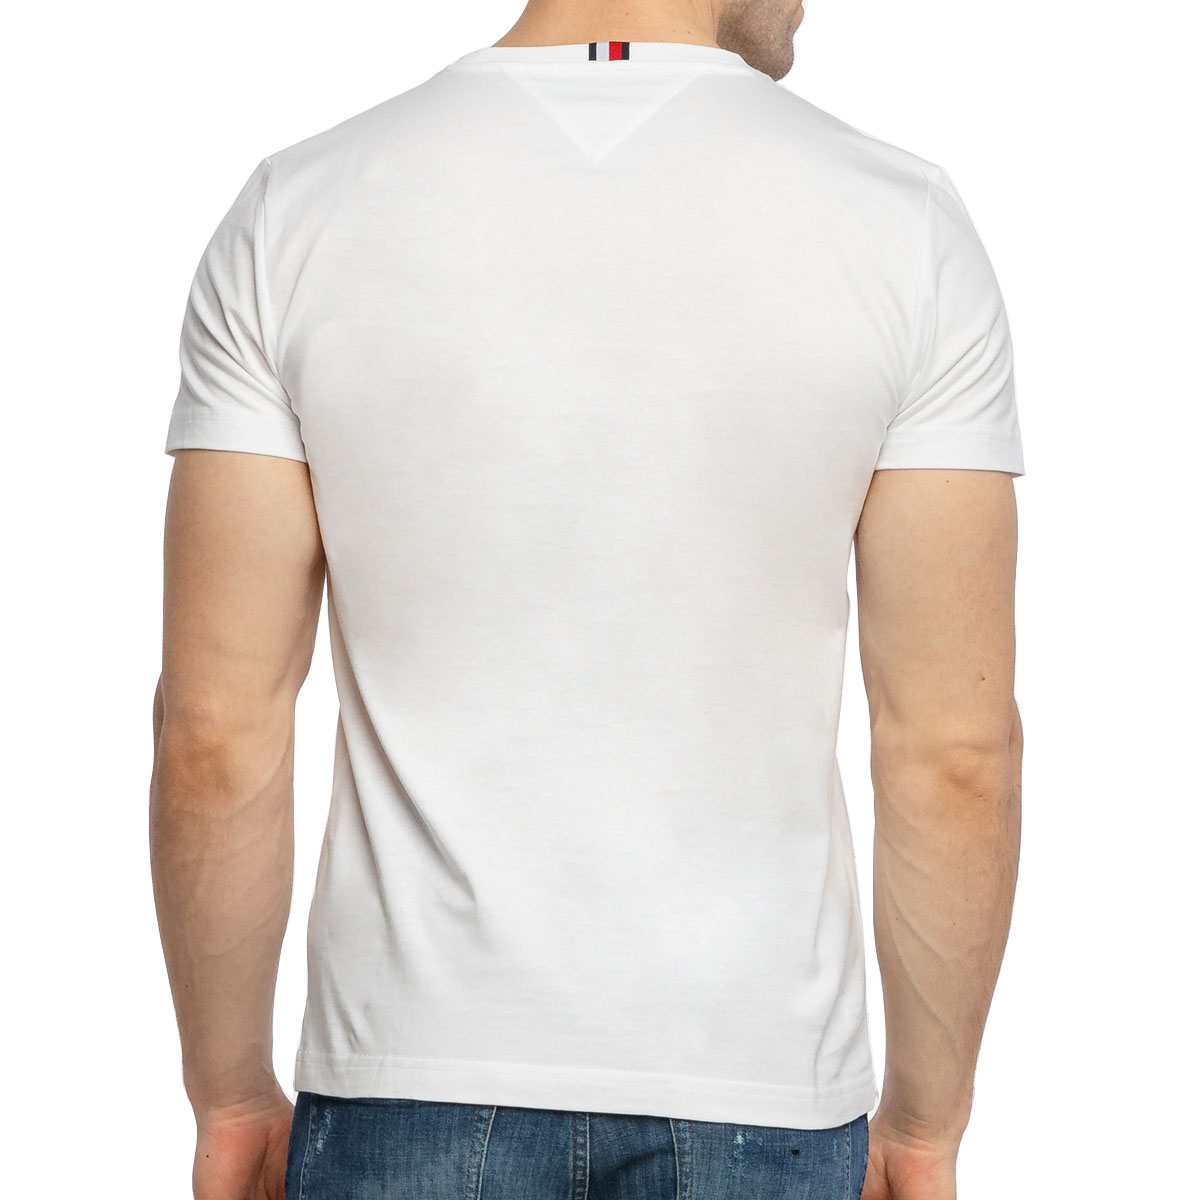 Camiseta Tommy Hilfiger Flag Bordado Branco